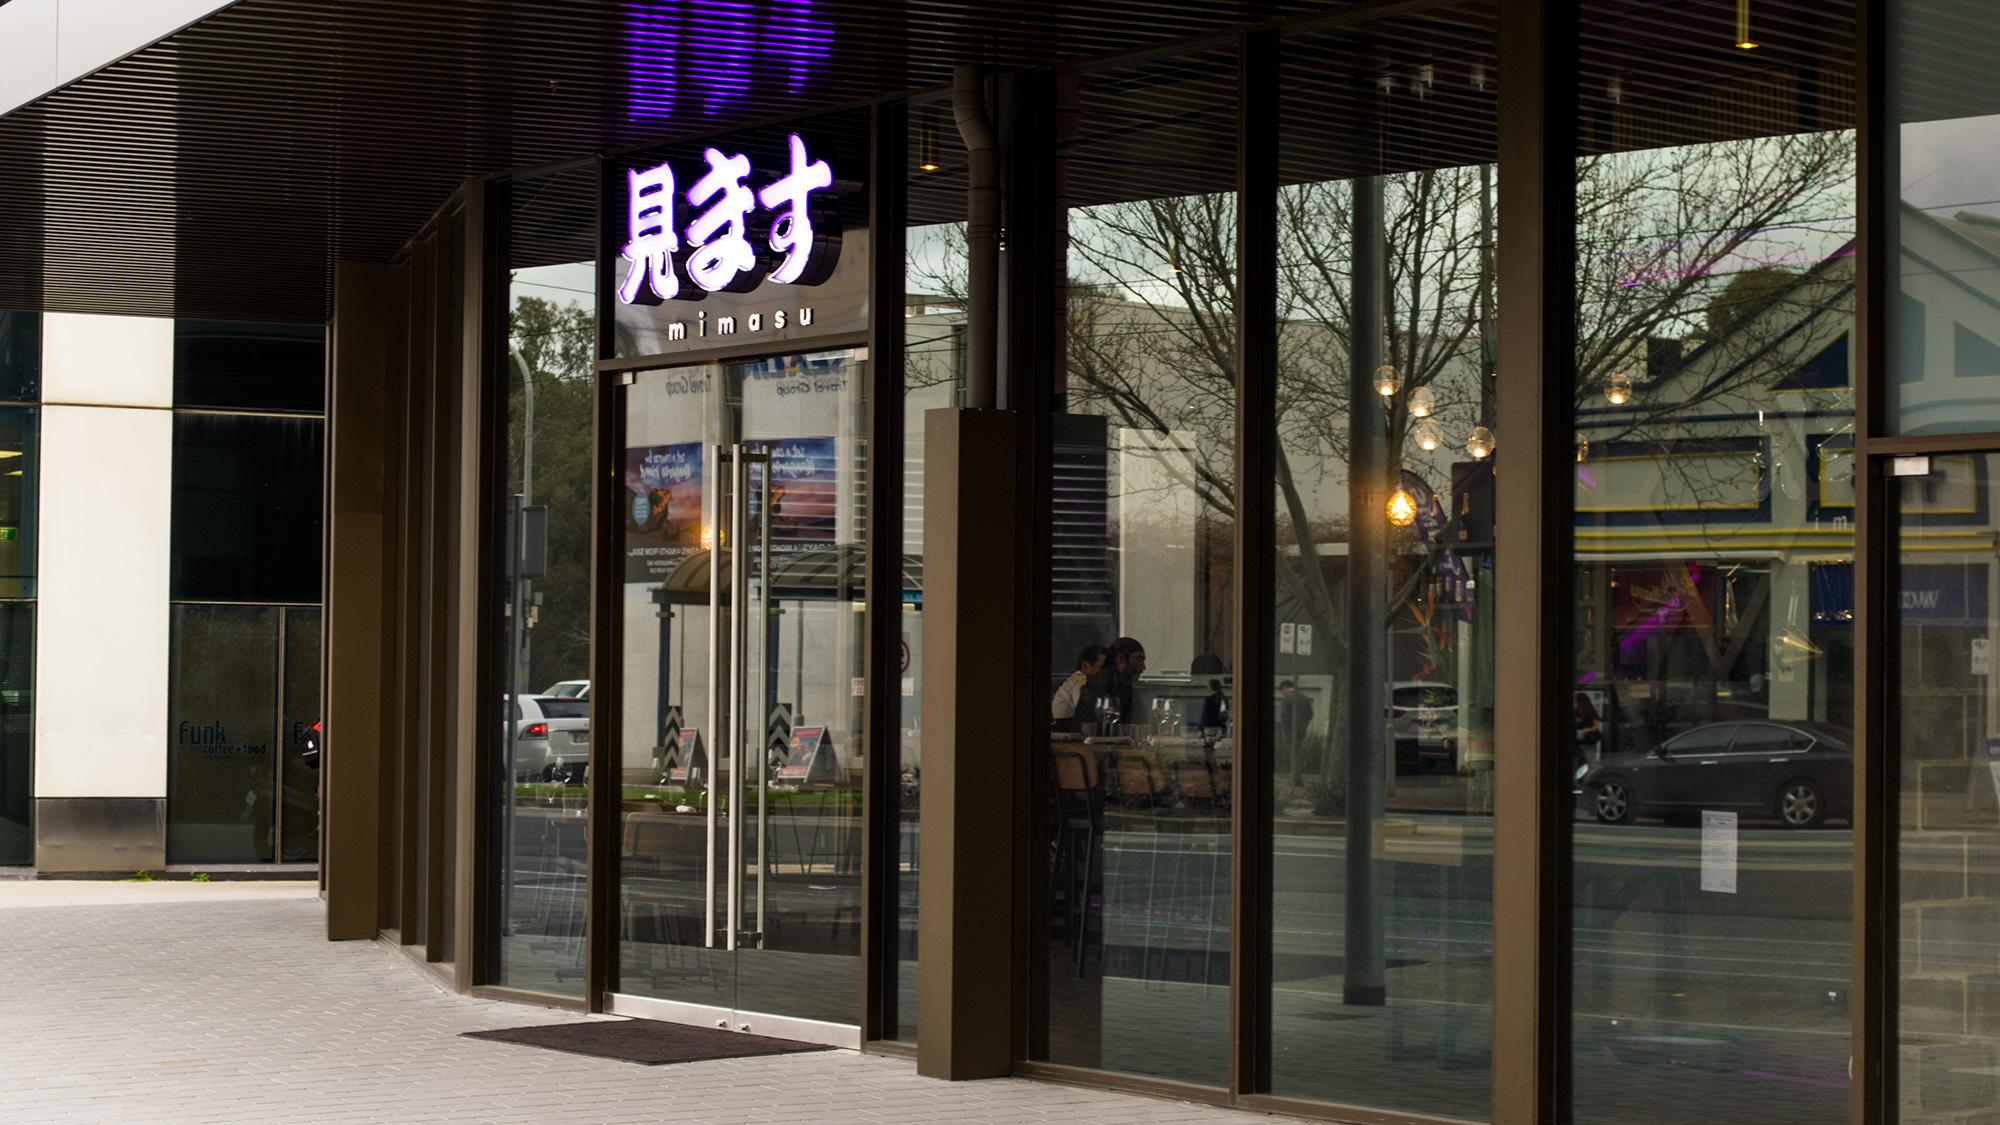 Mimasu Restaurant Adelaide